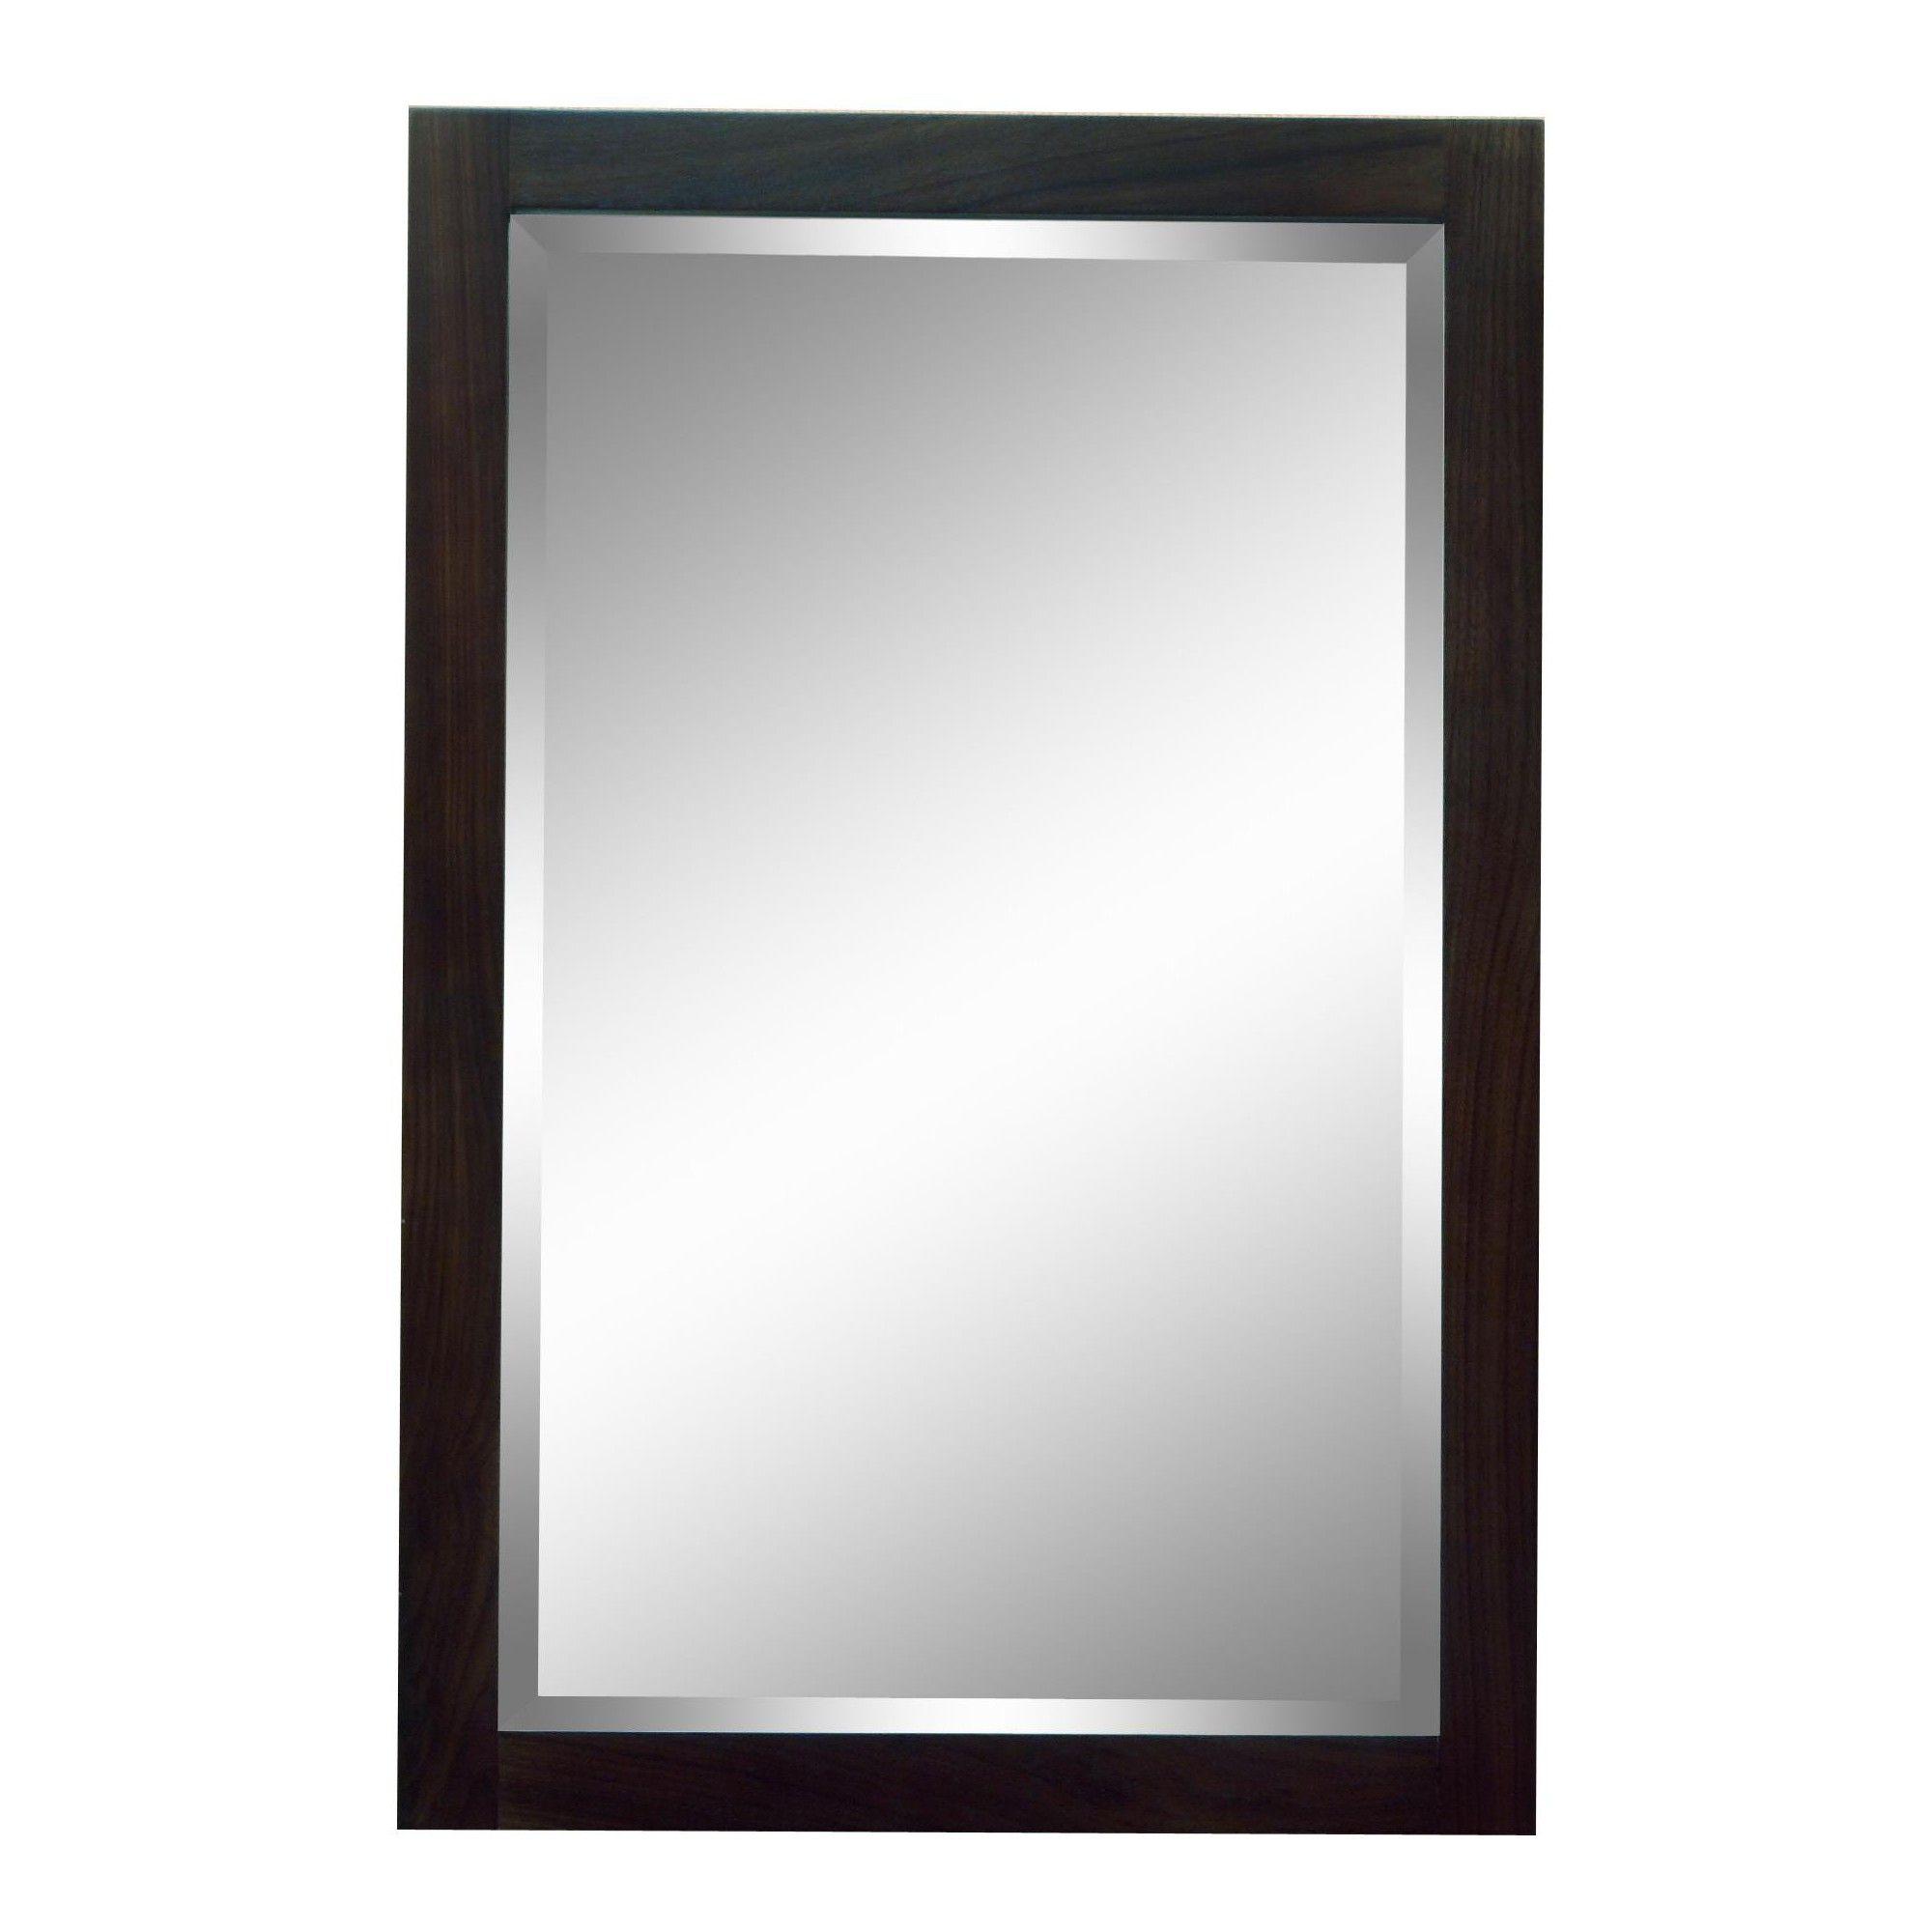 Sagehill Designs Mt2436m Modesta Walnut 24 Single Door Mirrored Cabinet Walnut No Finish Surface Mount Medicine Cabinet Mirror Cabinets Medicine Cabinet